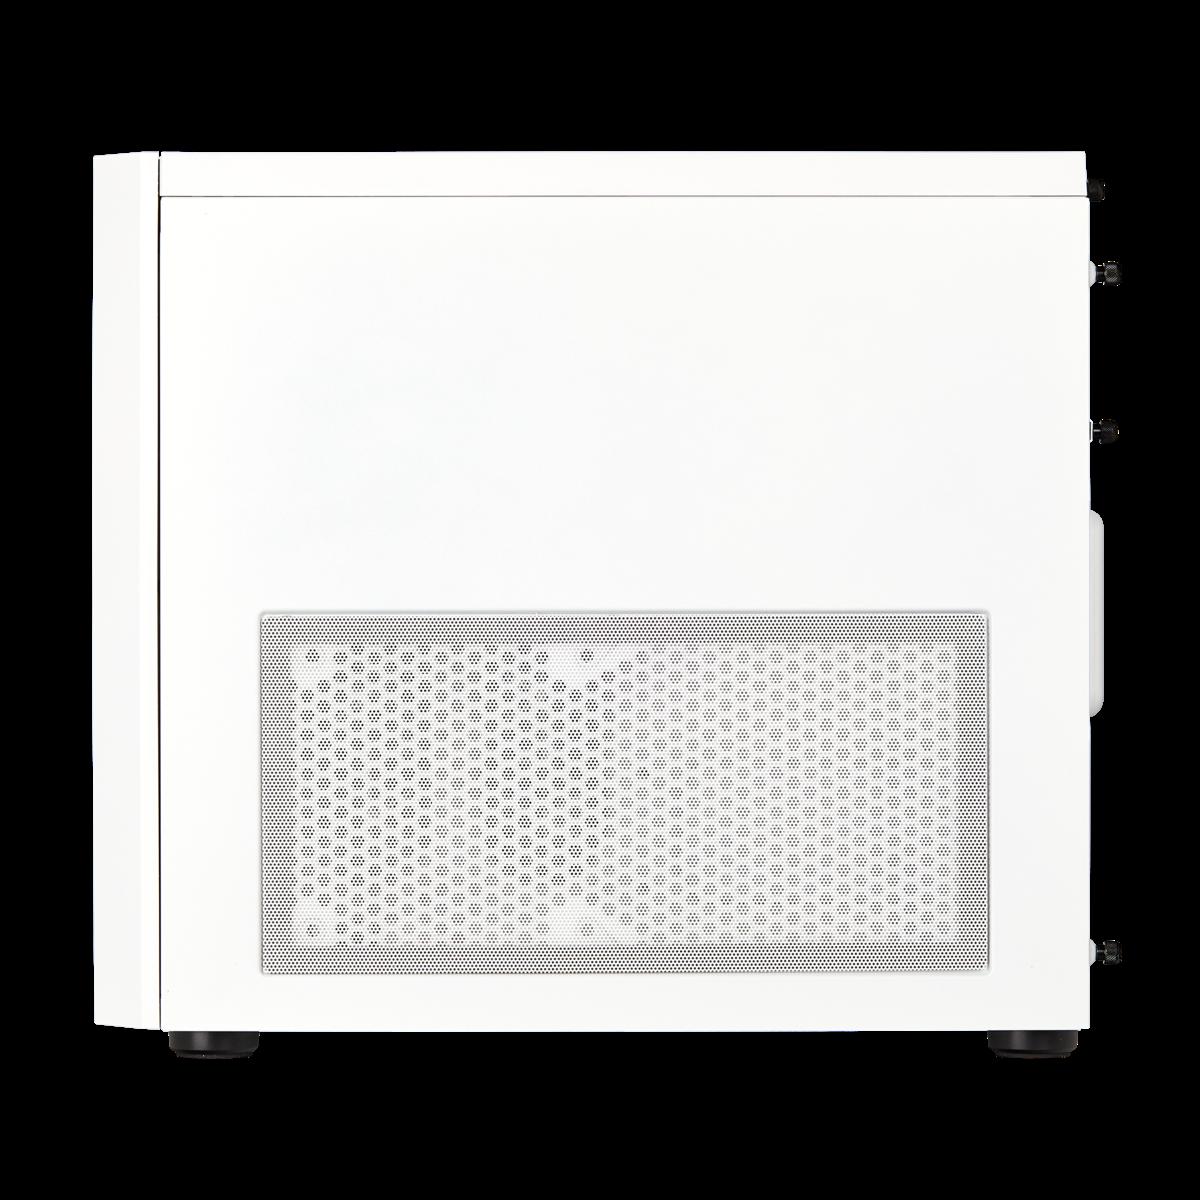 Corsair Desktop Casing Crystal Series 280X RGB Micro-ATX Case (CC-9011137-WW) (White), Massive Cooling, Stunning RGB Software Control, Three Panel Tempoered Glass